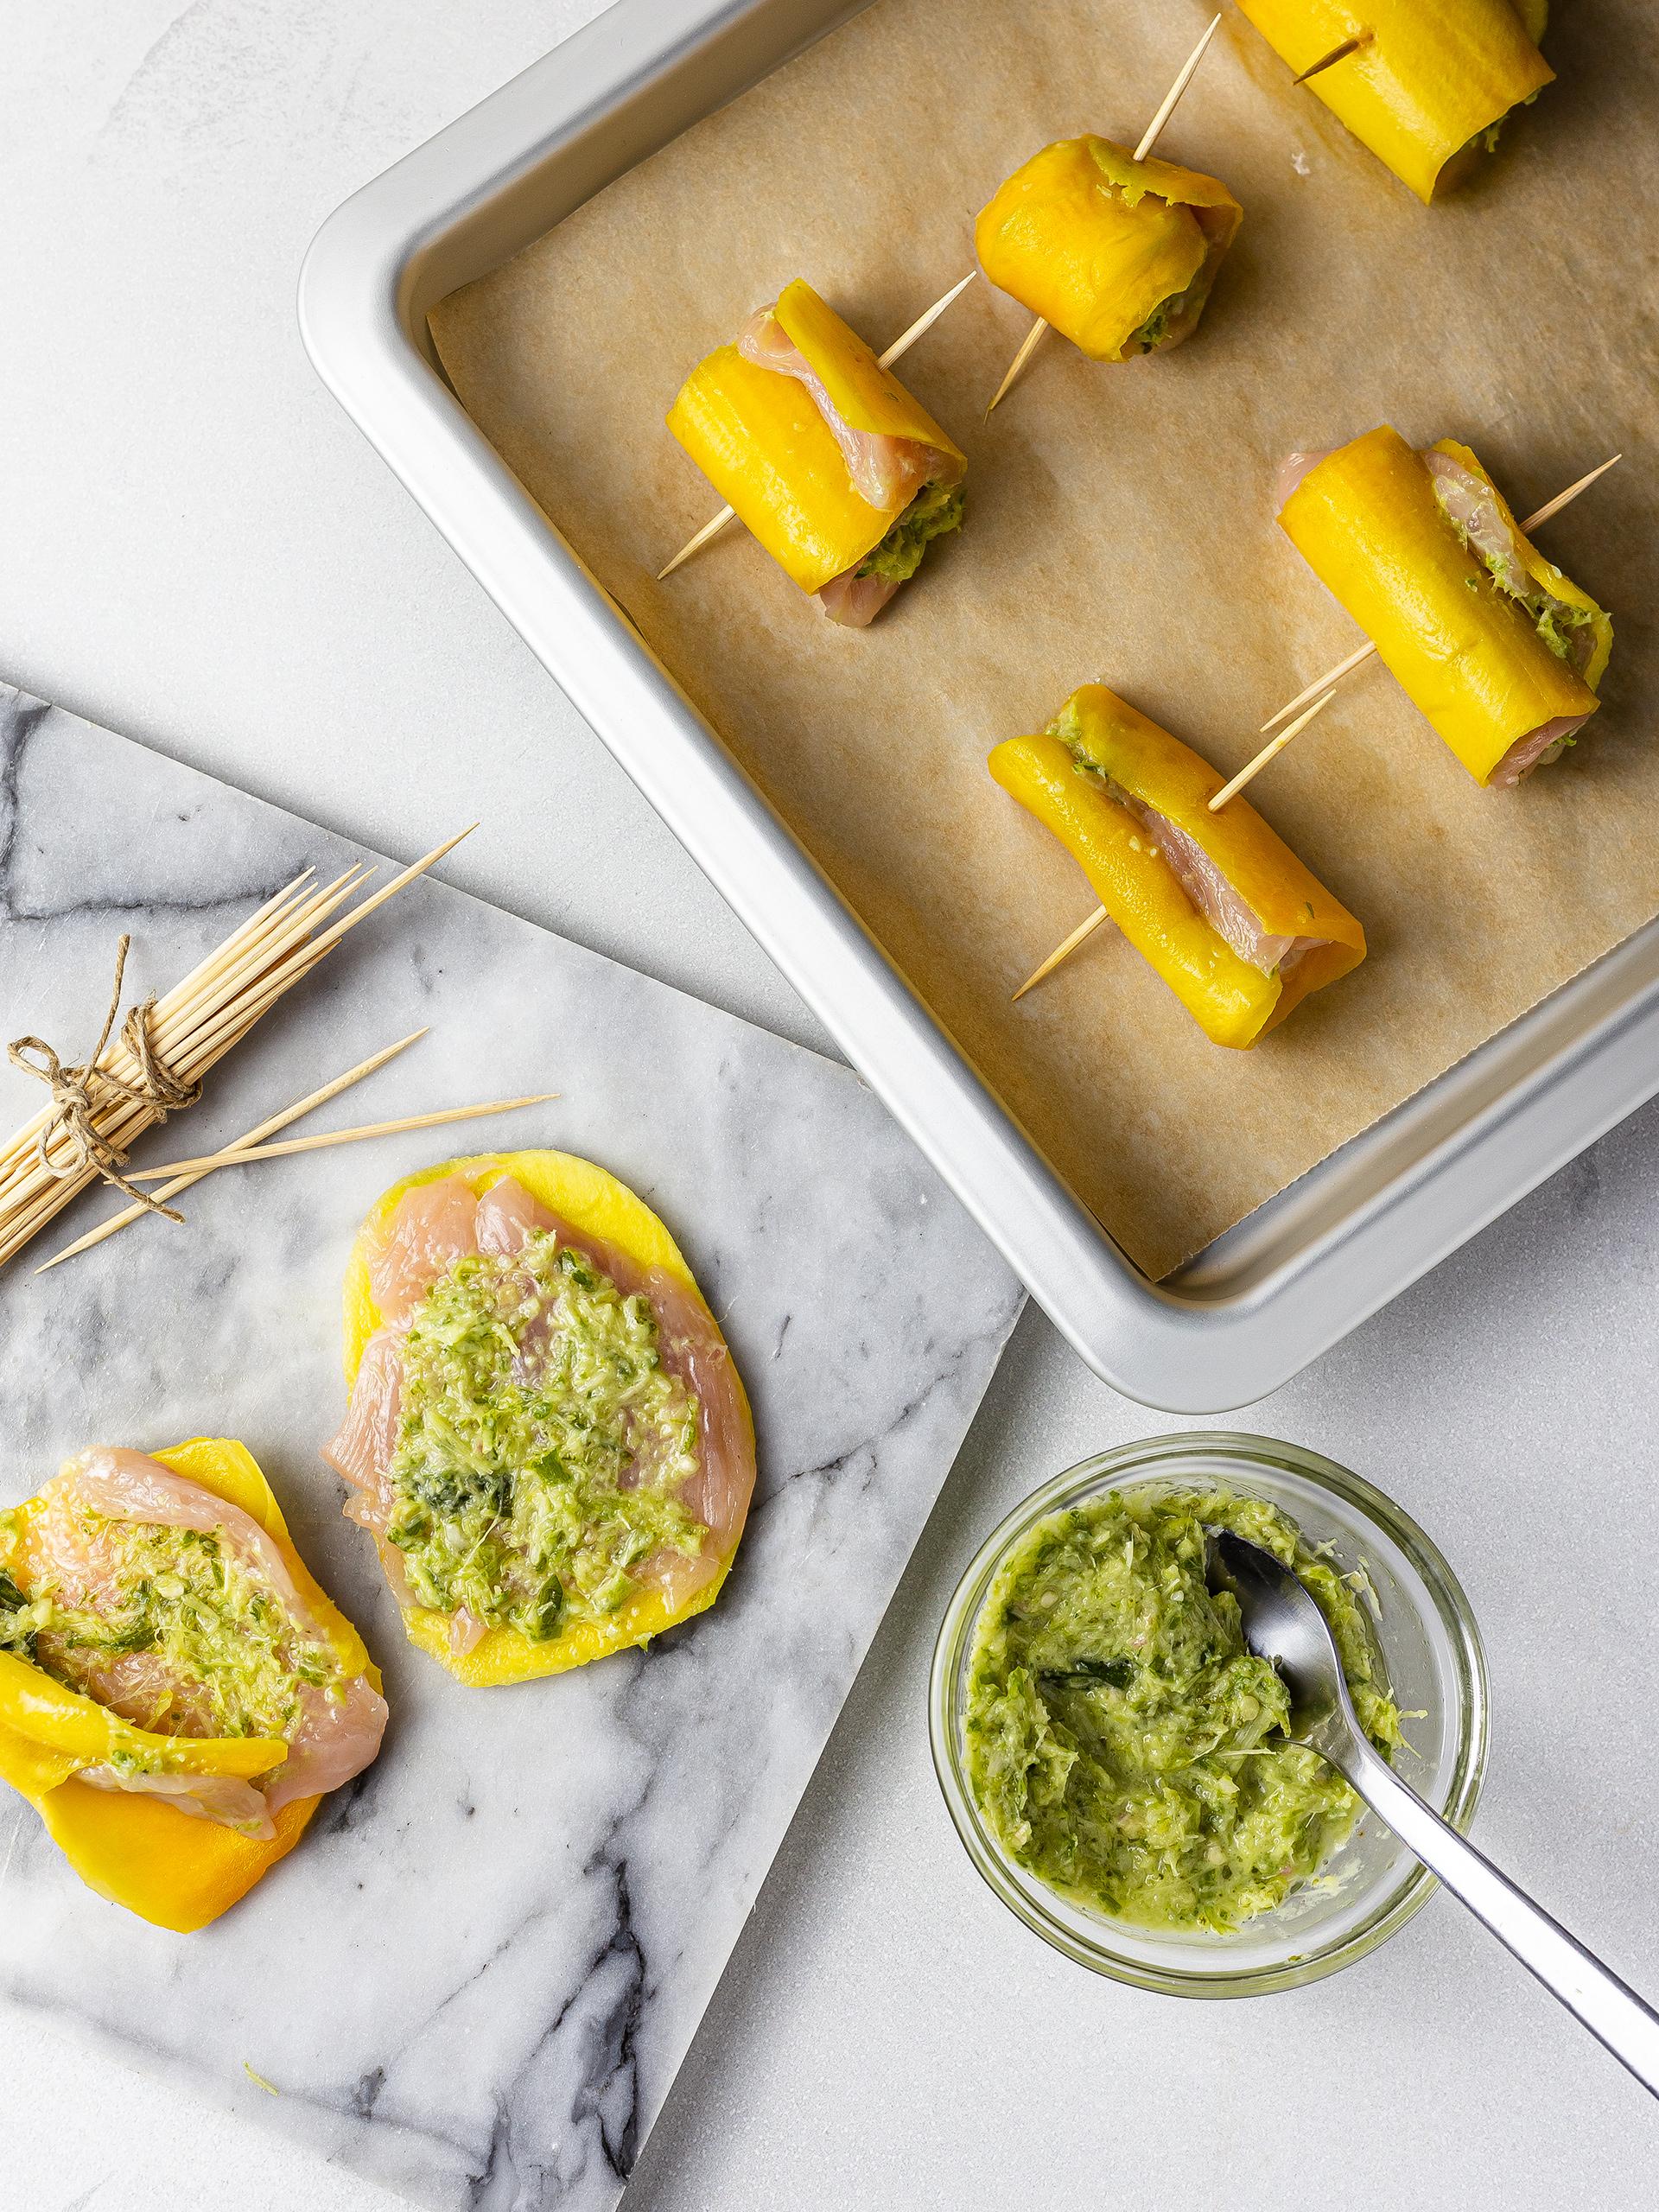 Mango chicken rolls with thai chili sauce filling